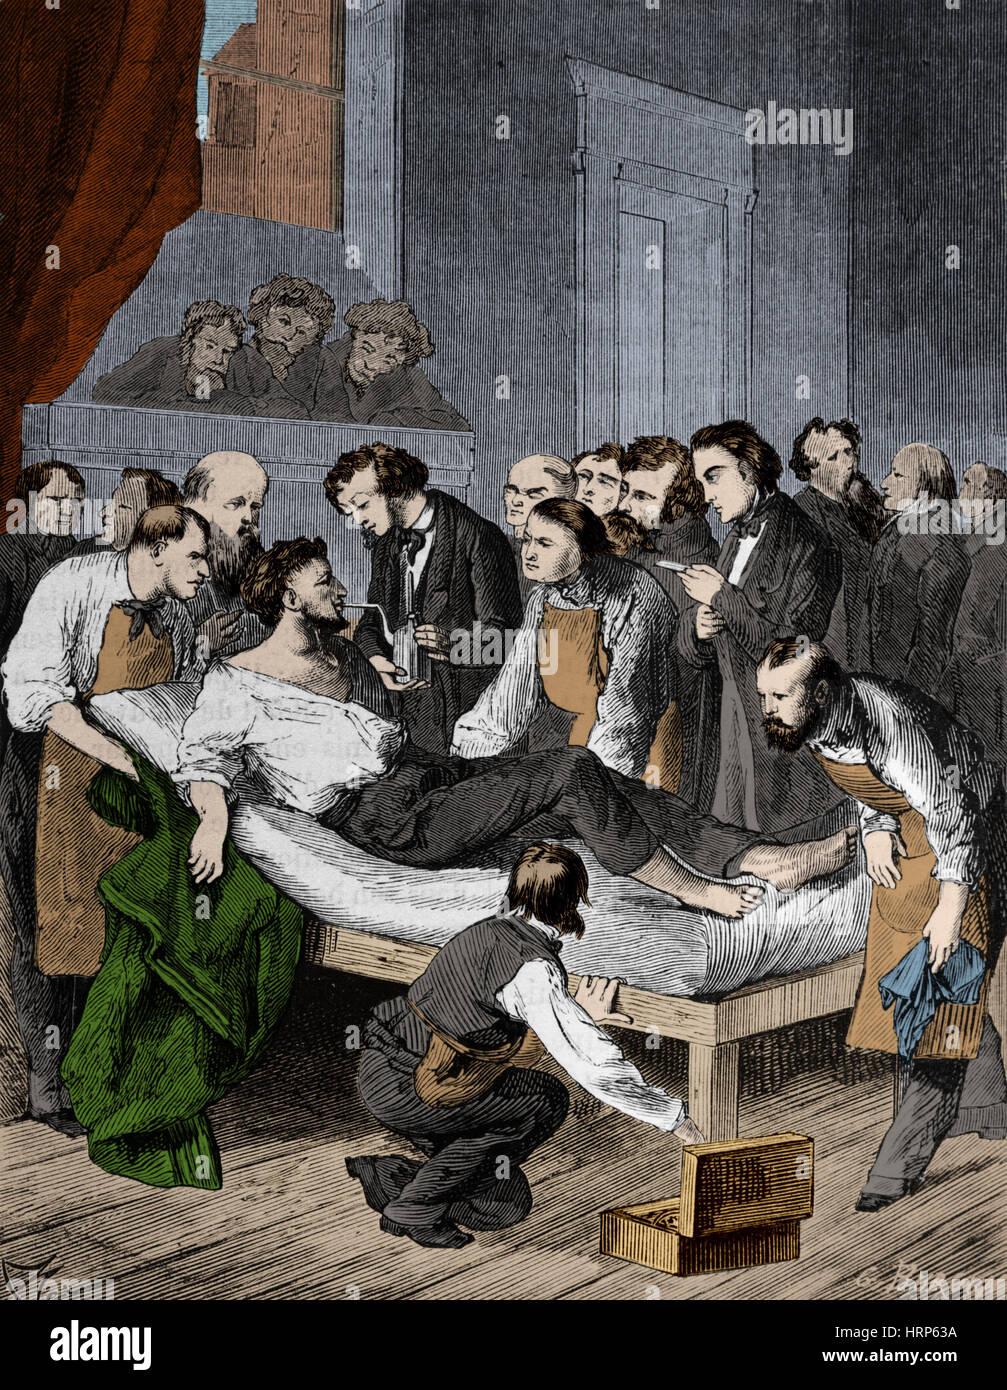 Anesthesia, 1846 - Stock Image